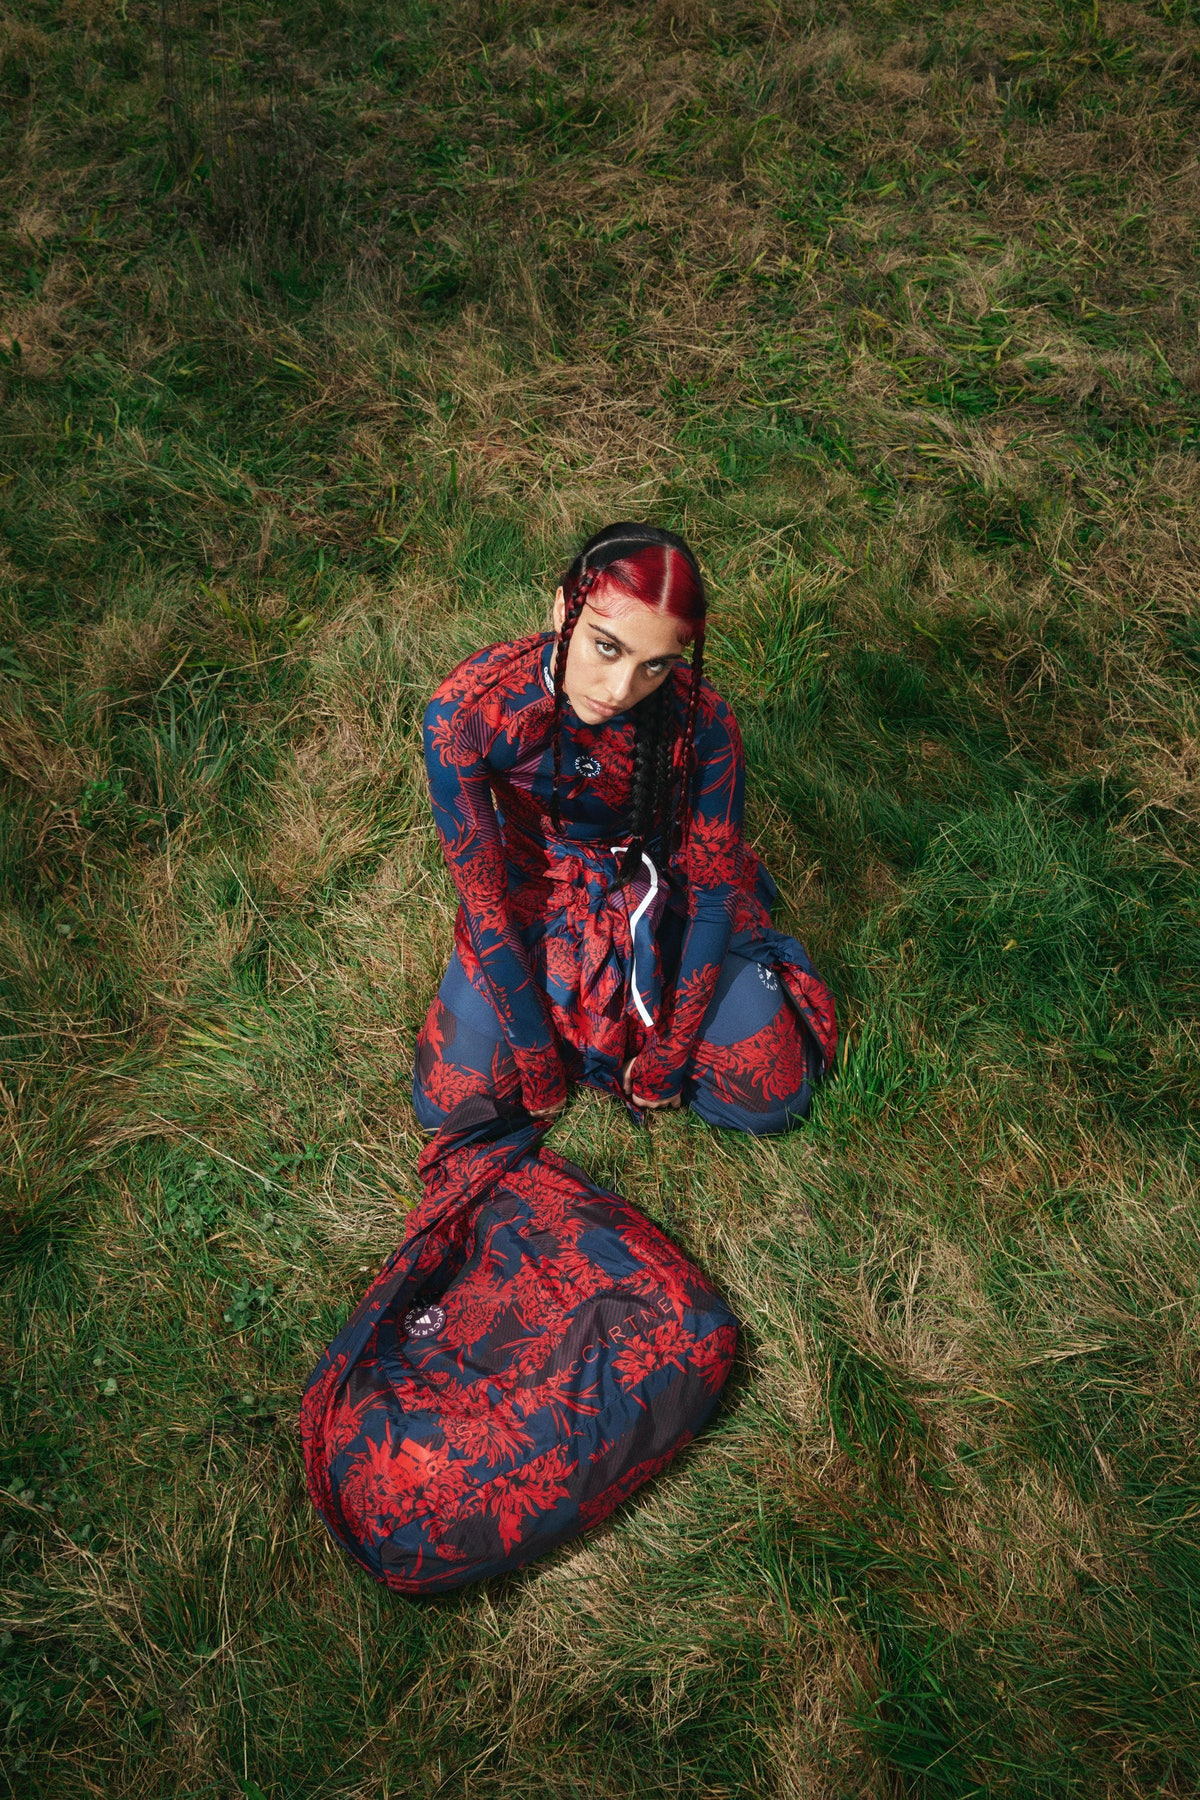 Lourdes Leon in a Stella McCartney campaign